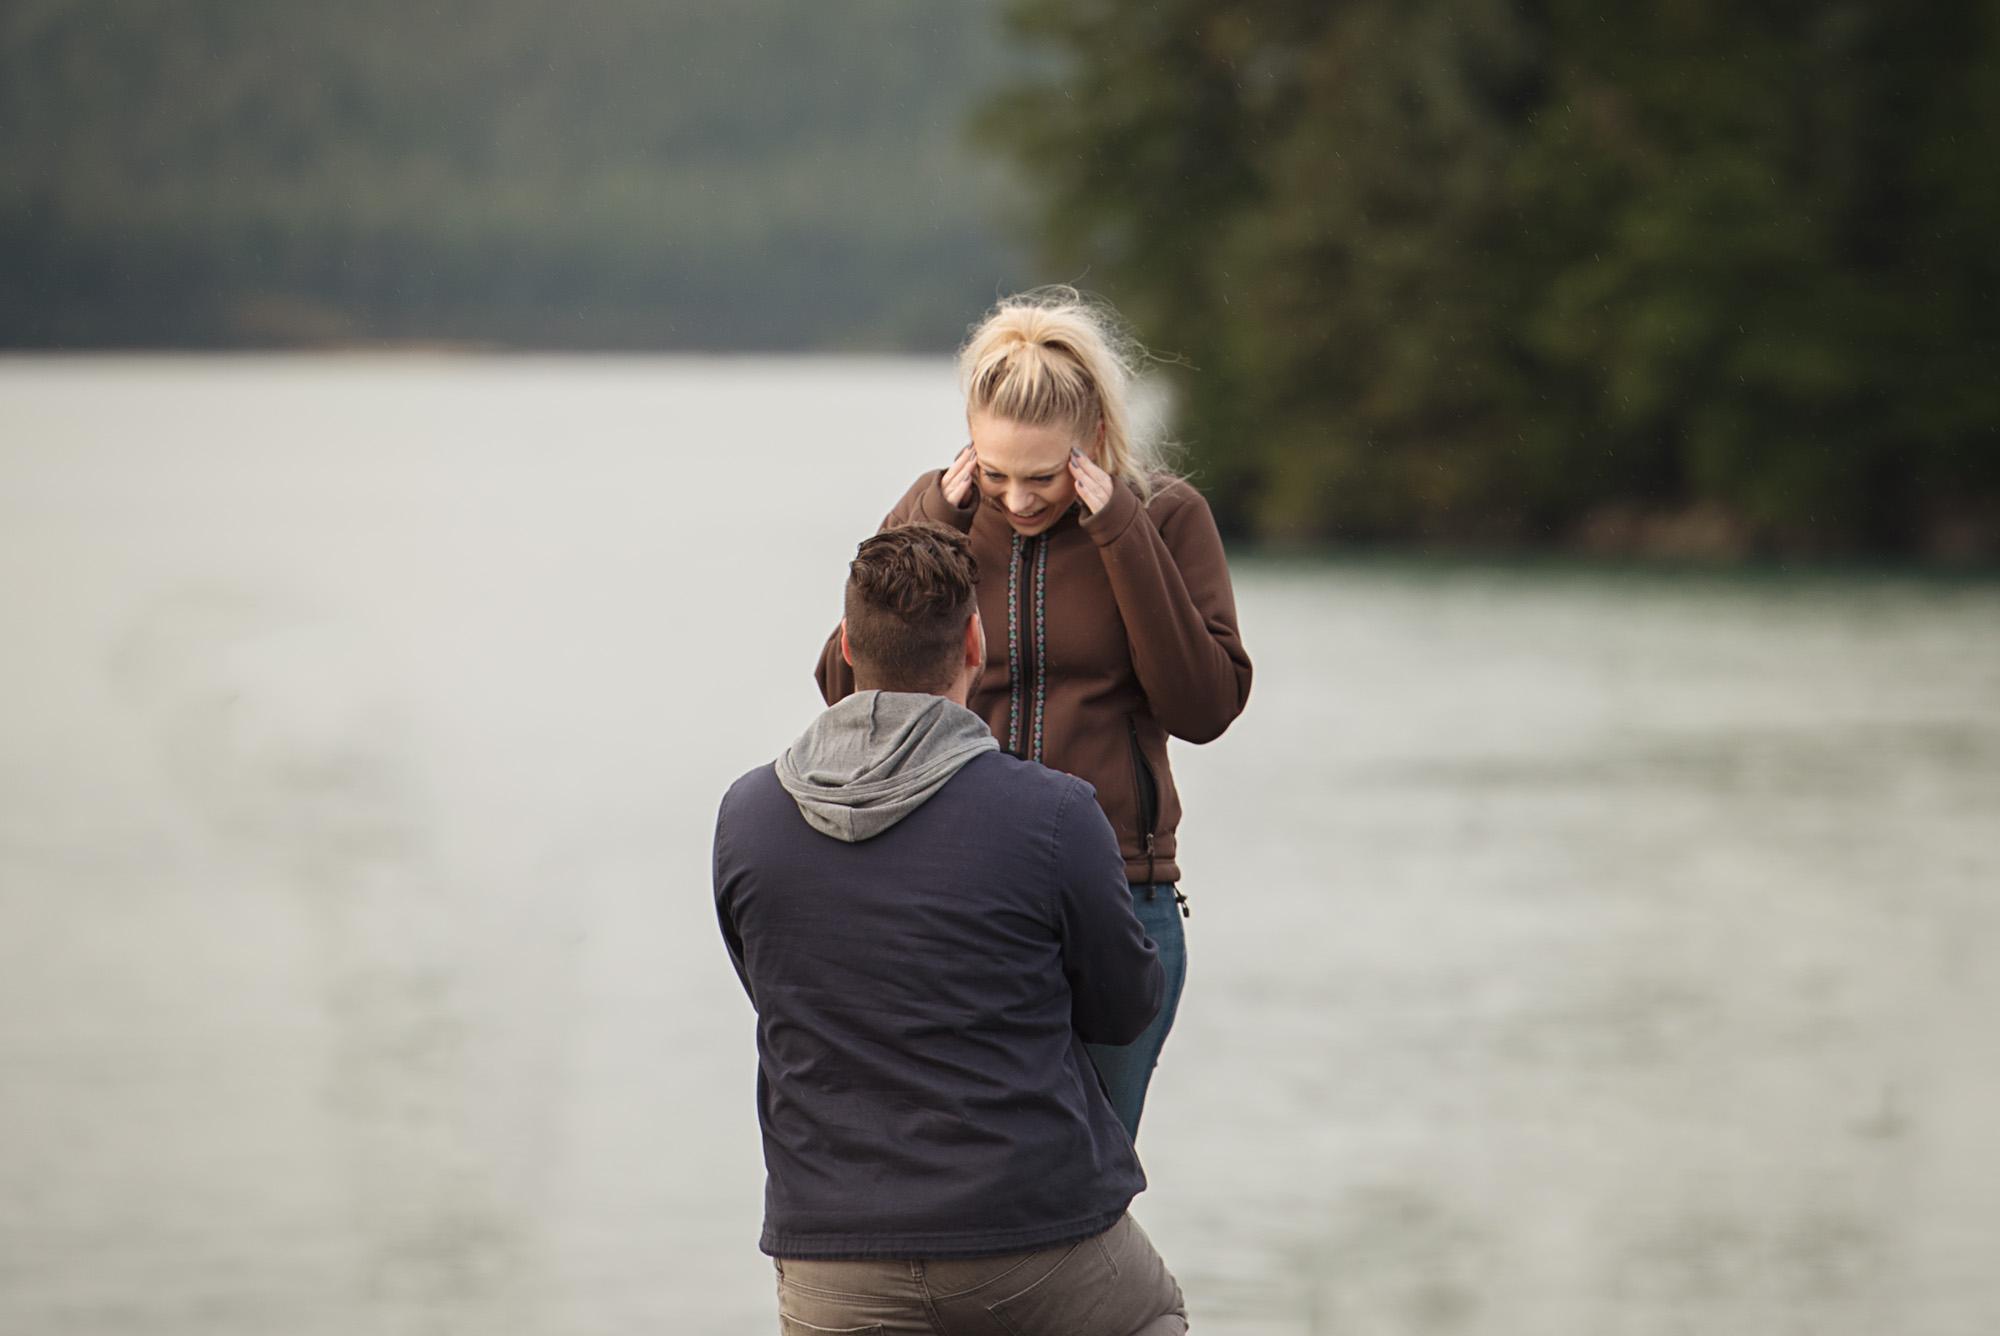 proposal photography engagement photographer Breanna Mills Photography cordova (1).jpg